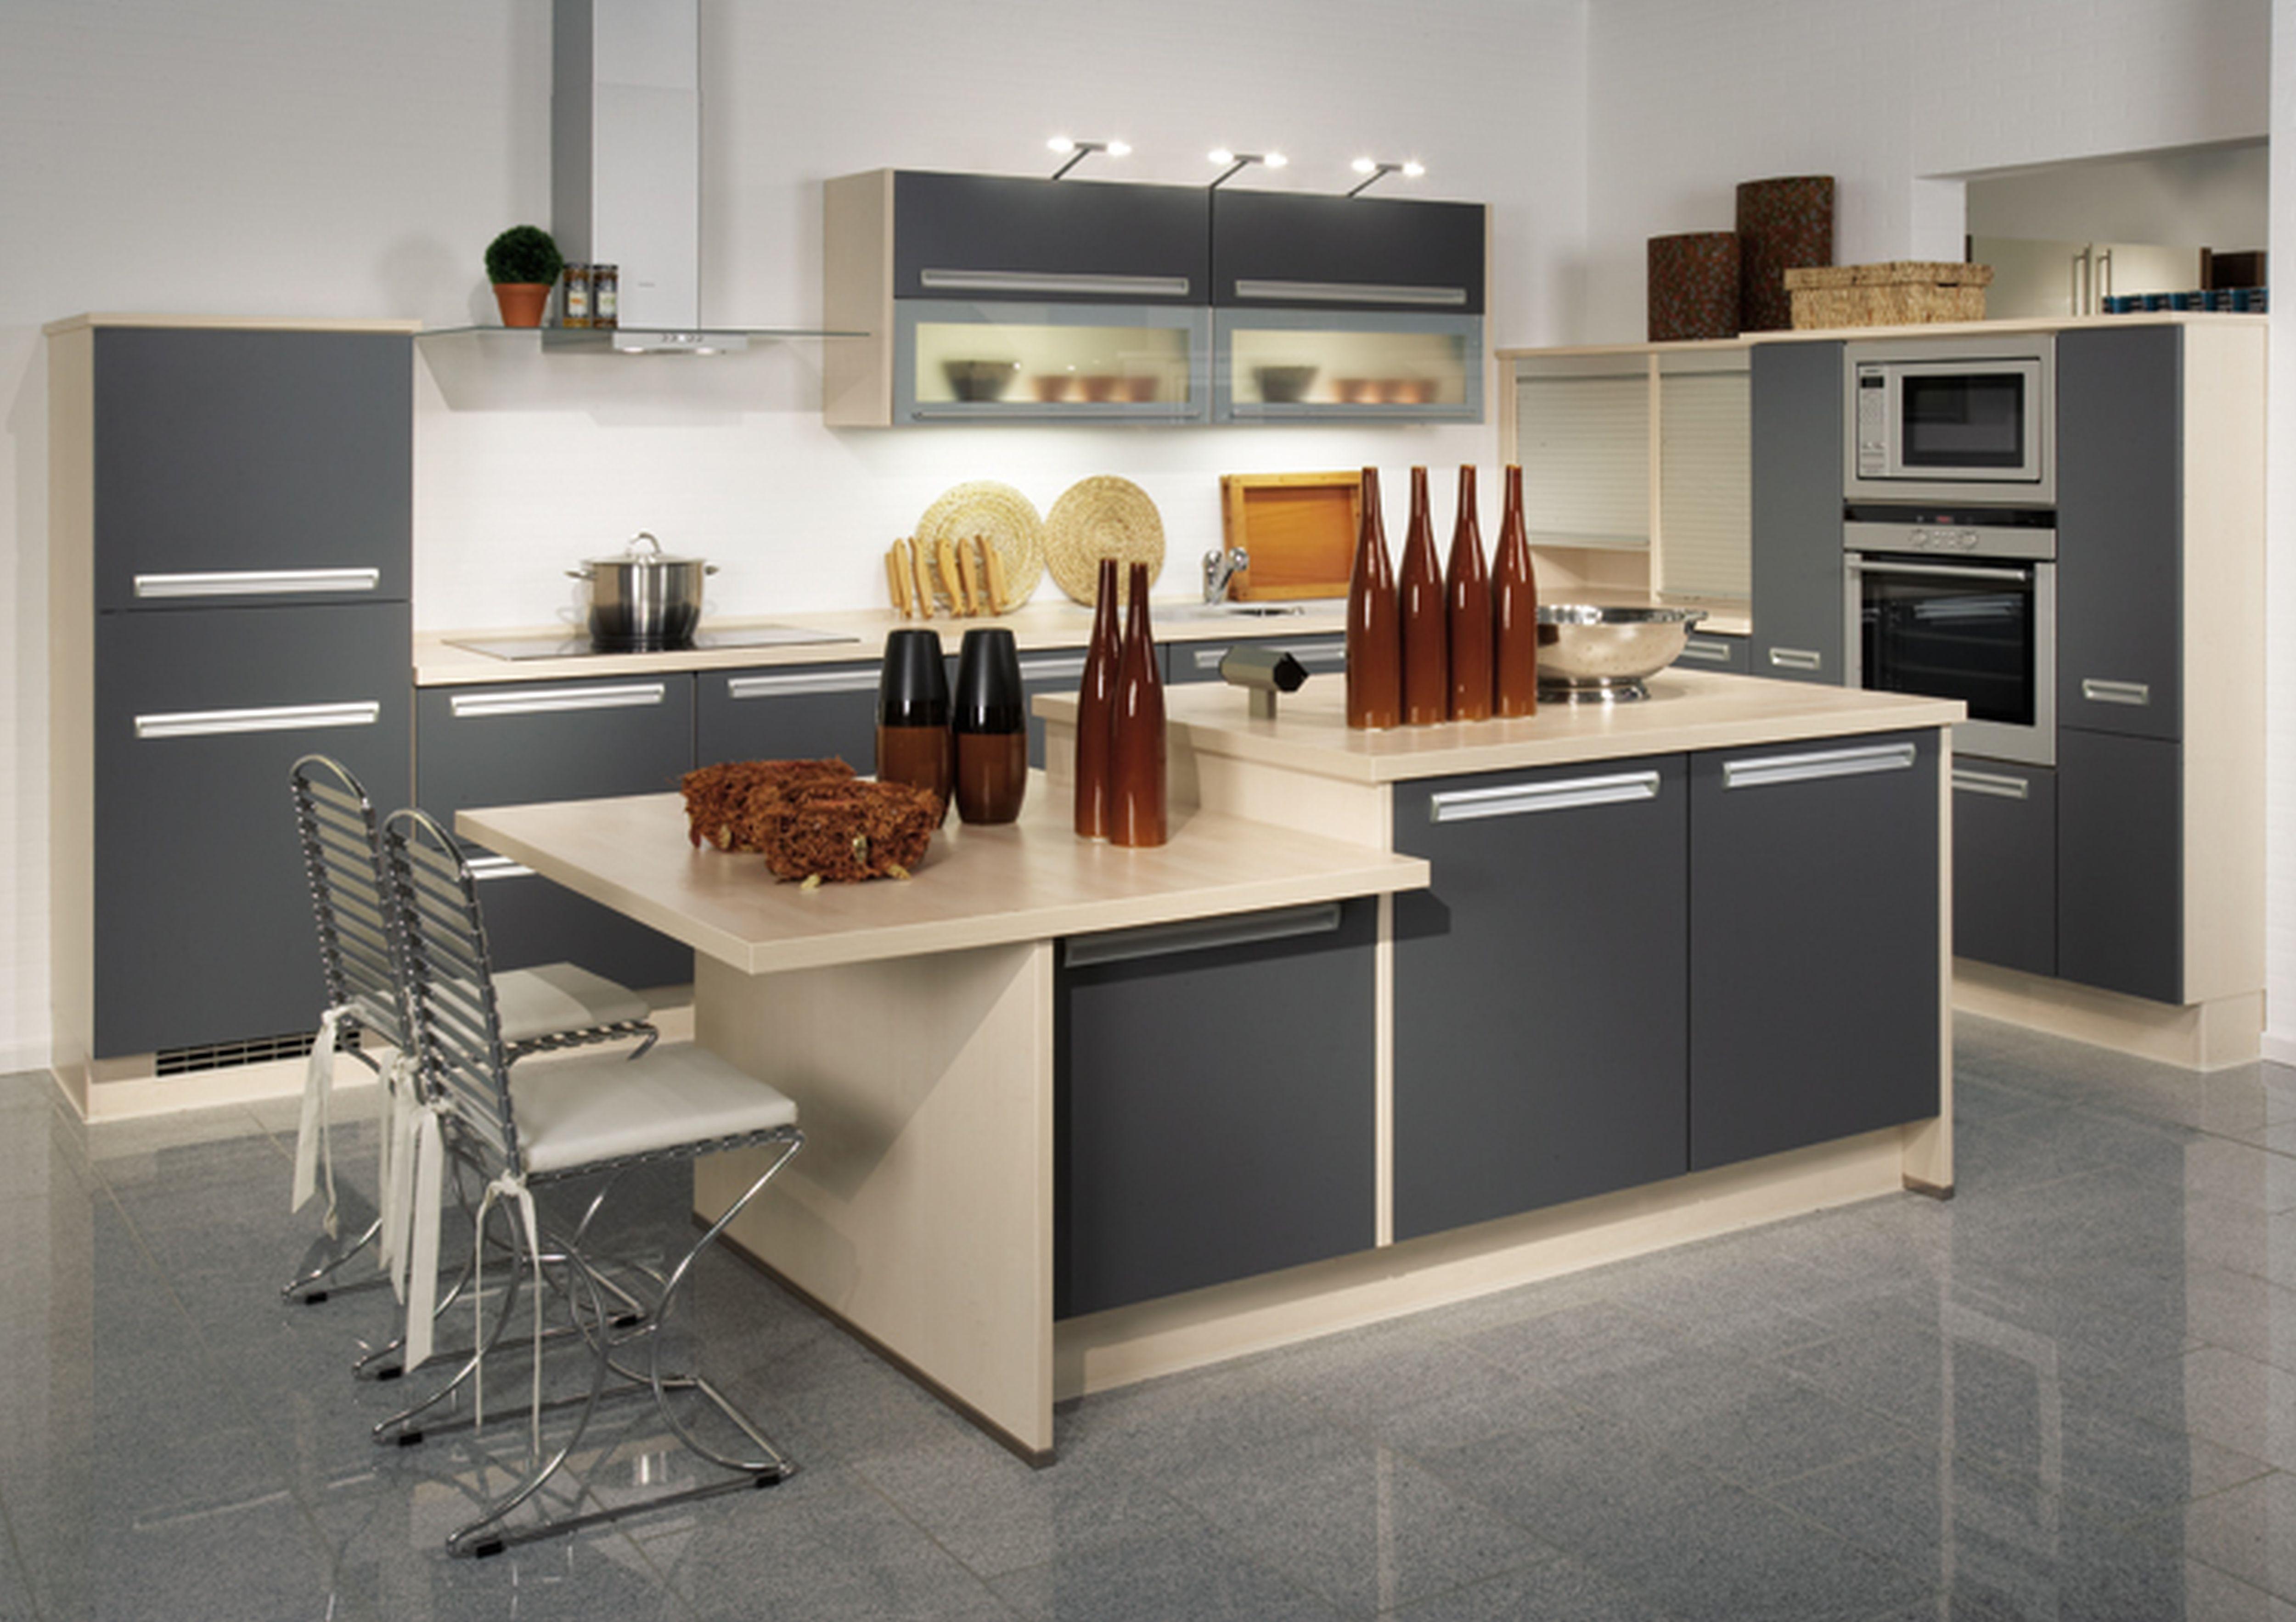 Fabulousideasofbeautifulkitchendesignwithcreamywhiteikea Beauteous 3D Design Kitchen Decorating Design